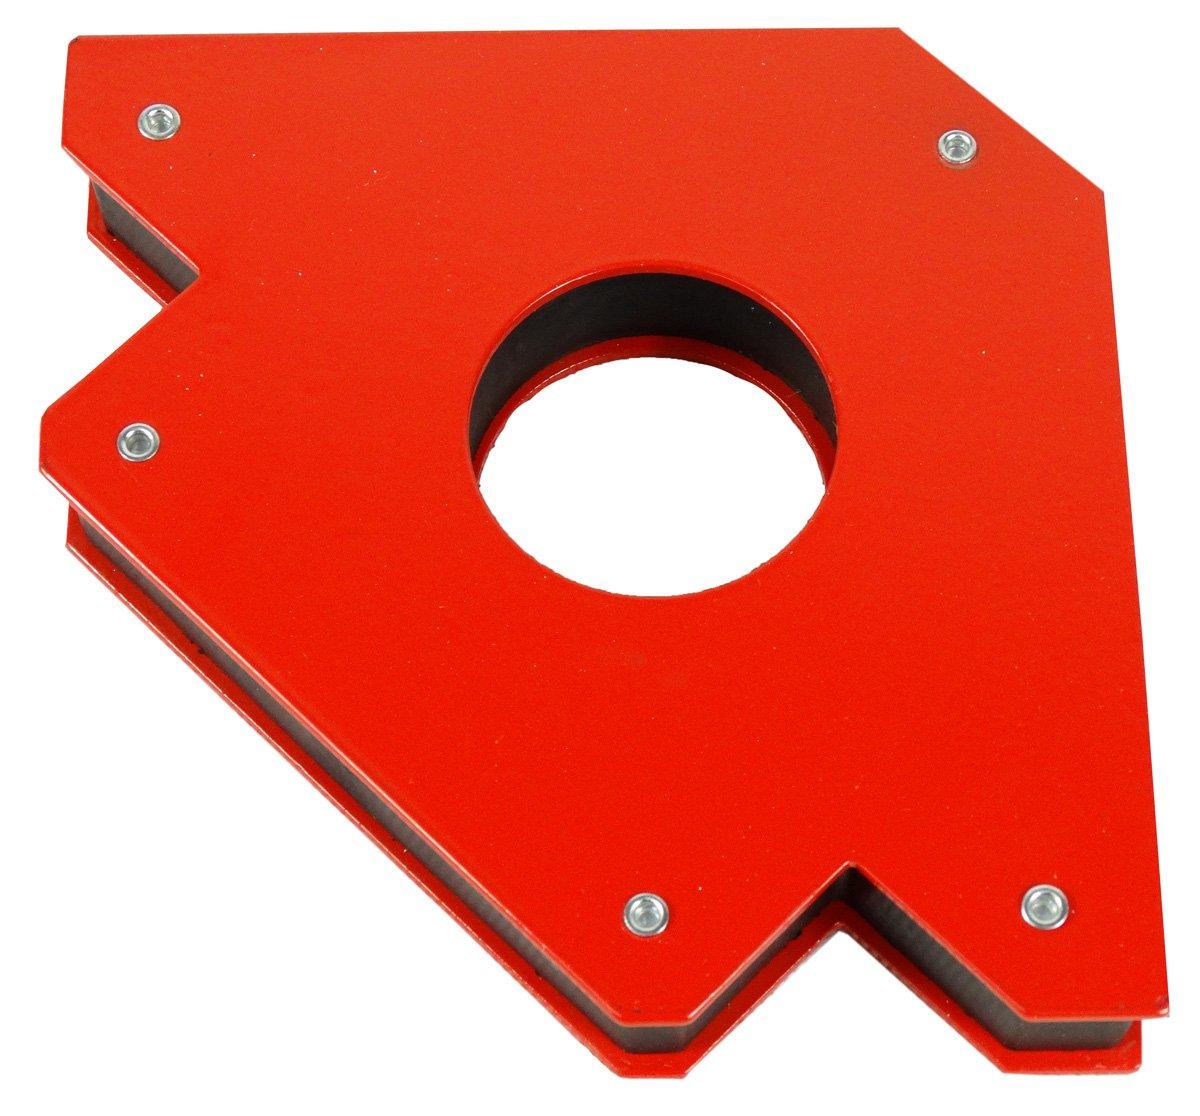 Holder zvárania magnetického uhla 22,5 kg